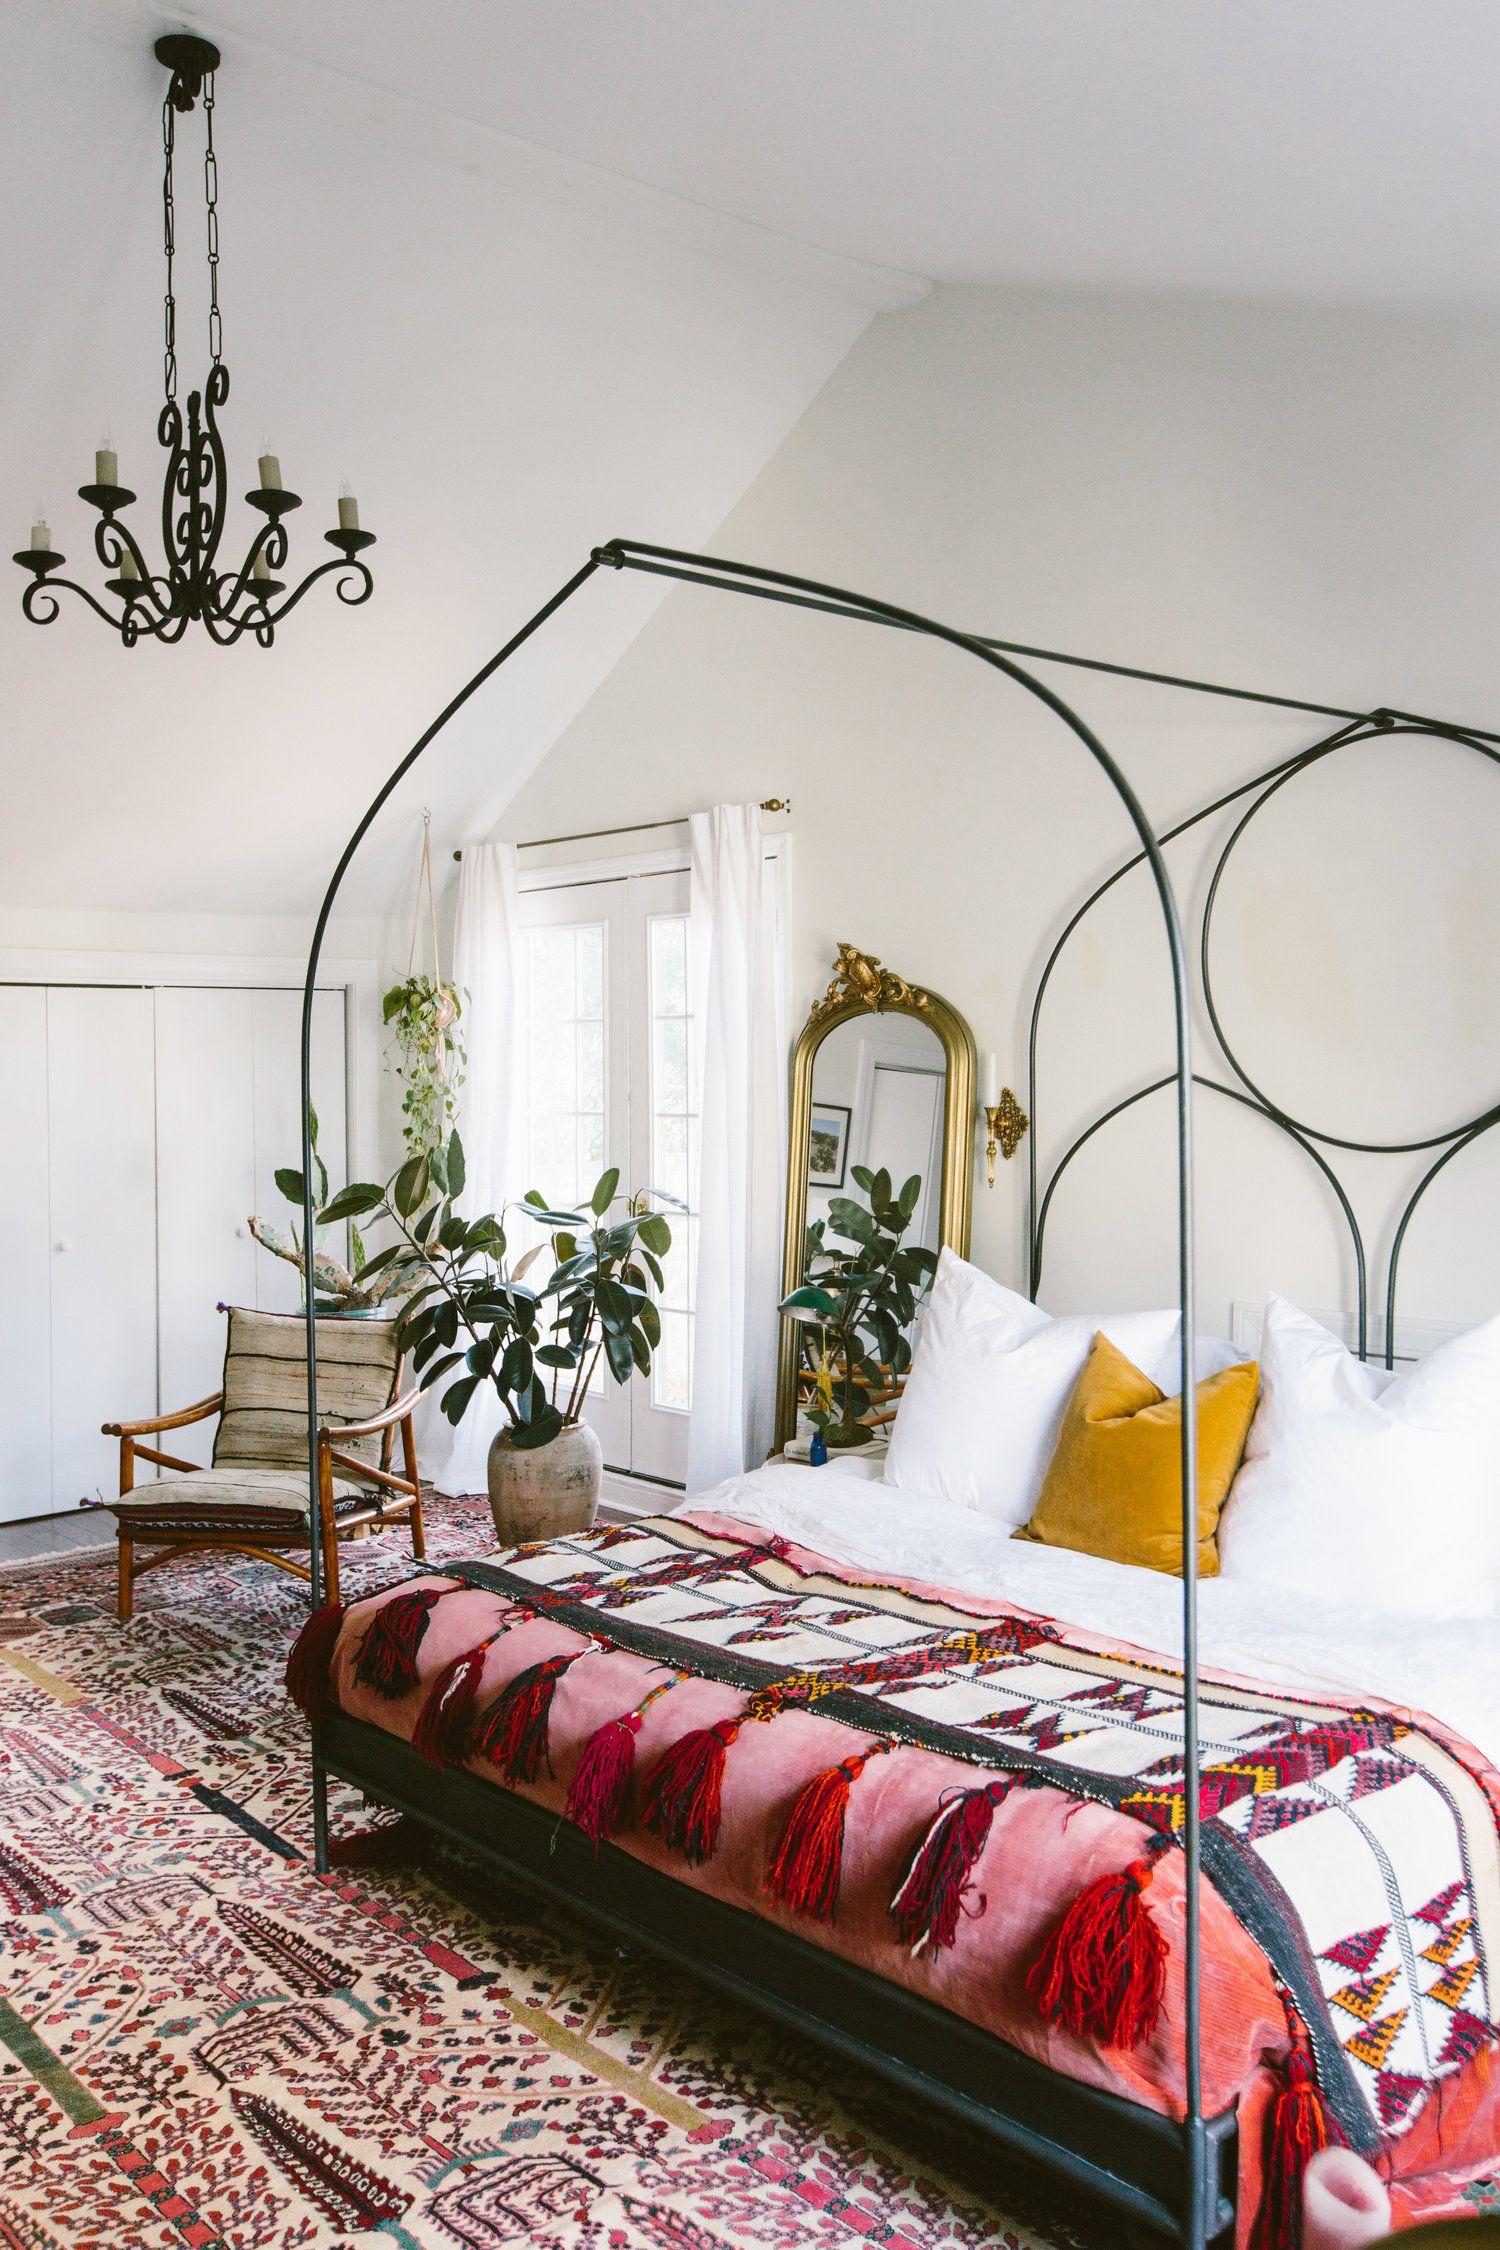 Best Bedroom Interior Design Eclectic Style Bohemian 400 x 300